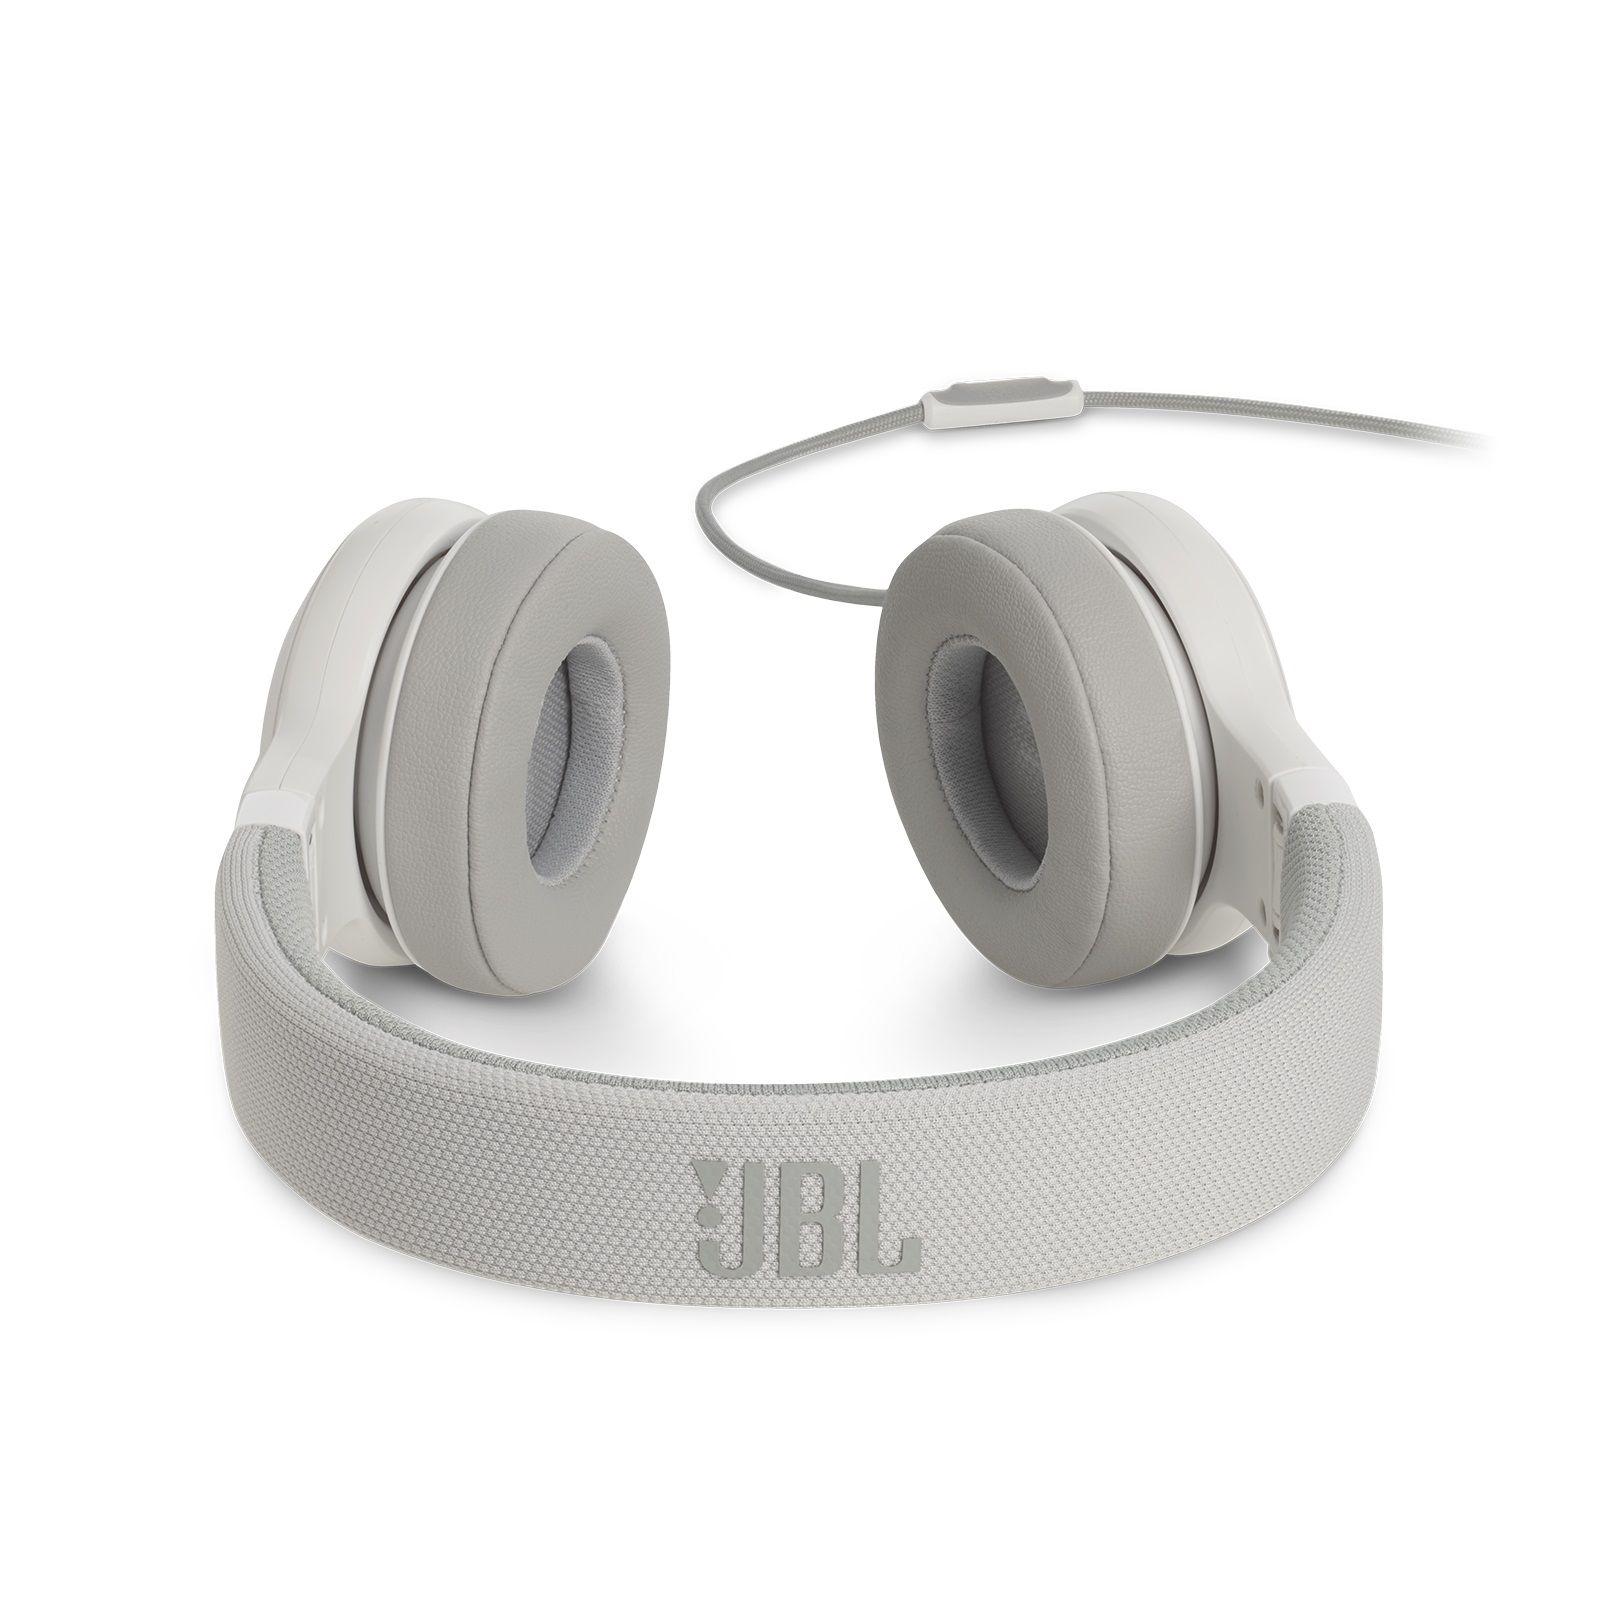 Fone De Ouvido Jbl E35 Wht On Ear